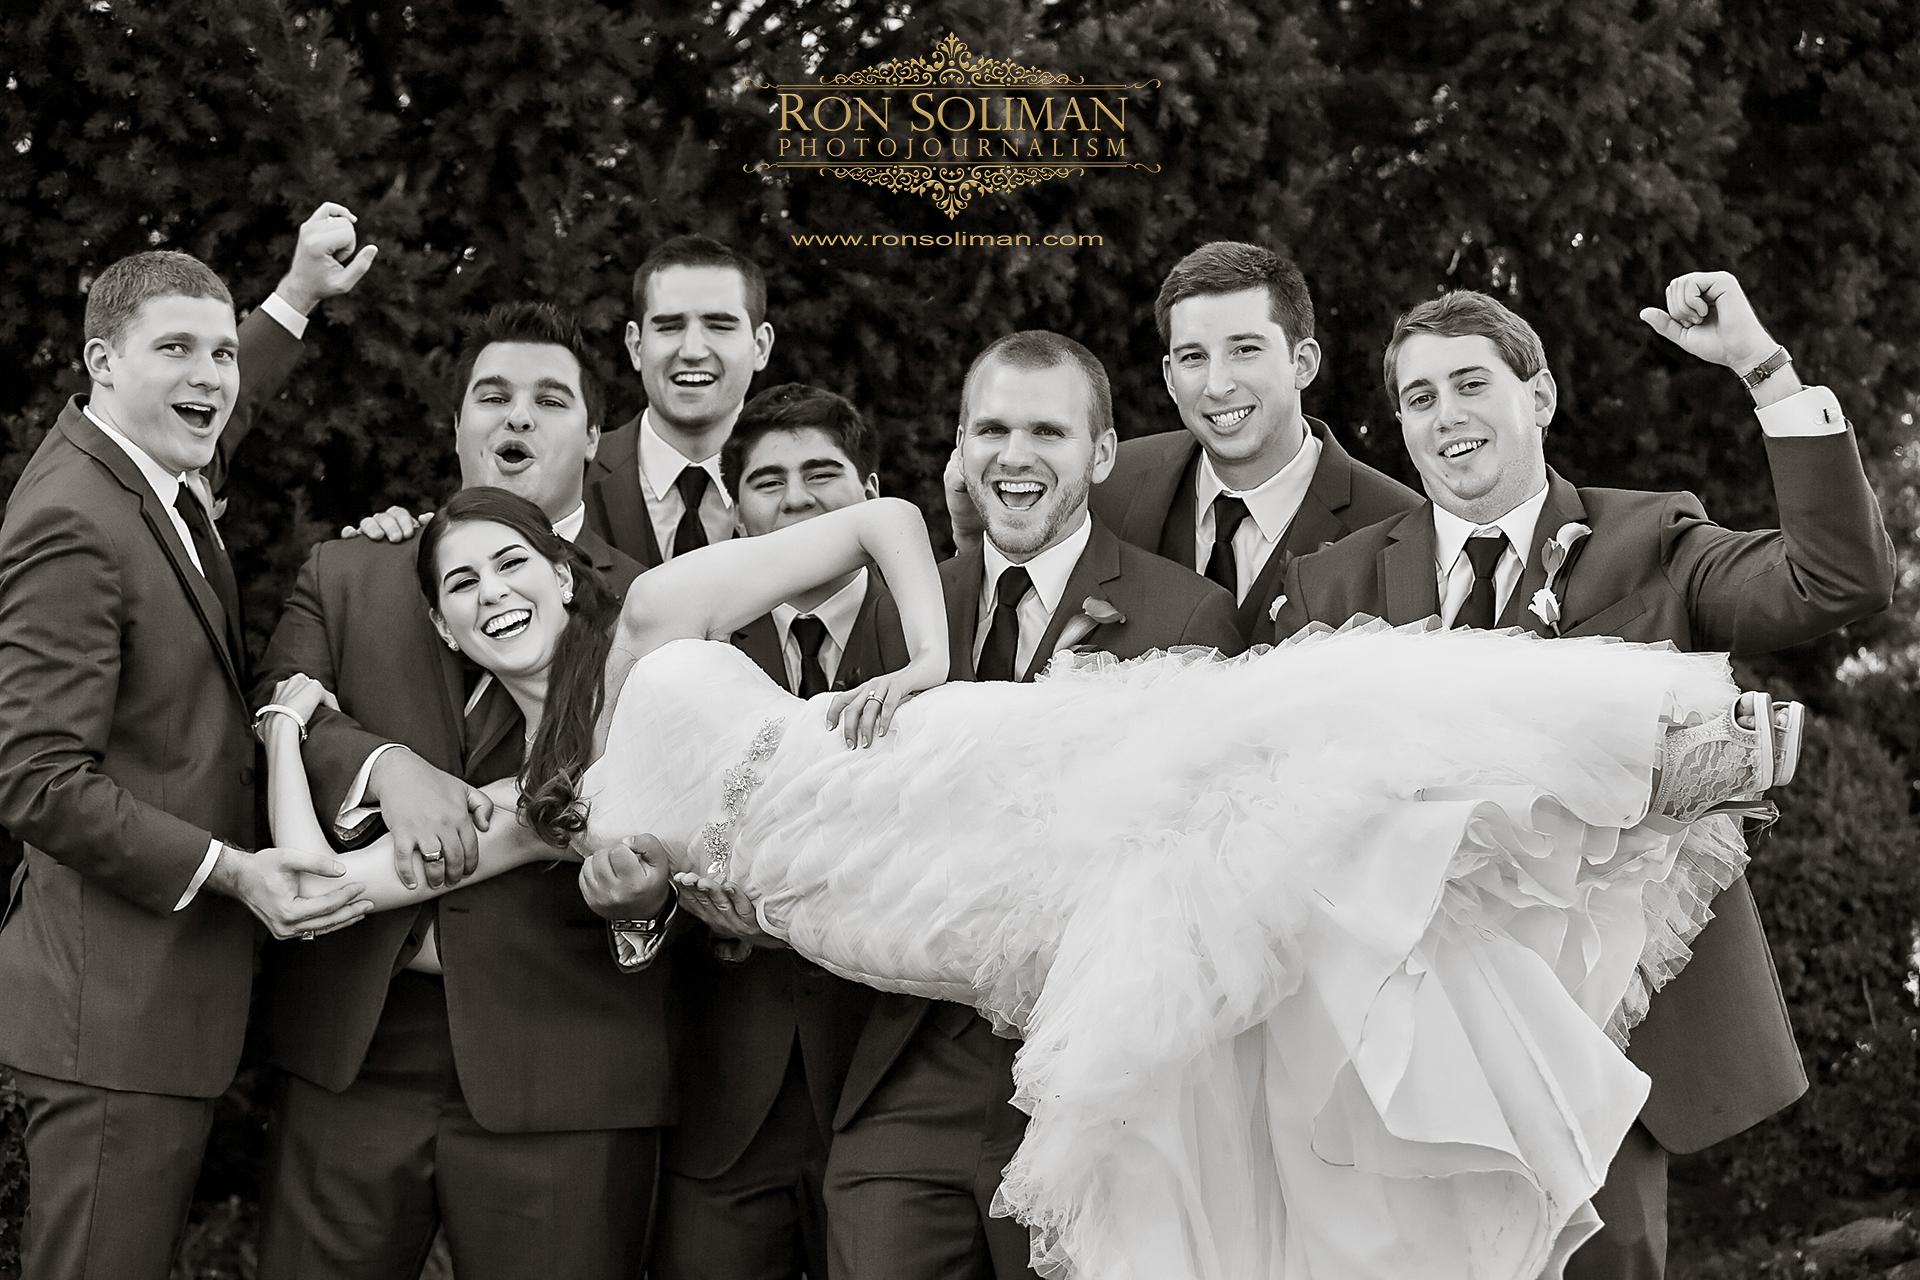 bridal party photo at the Lincoln Memorial in Washington DC